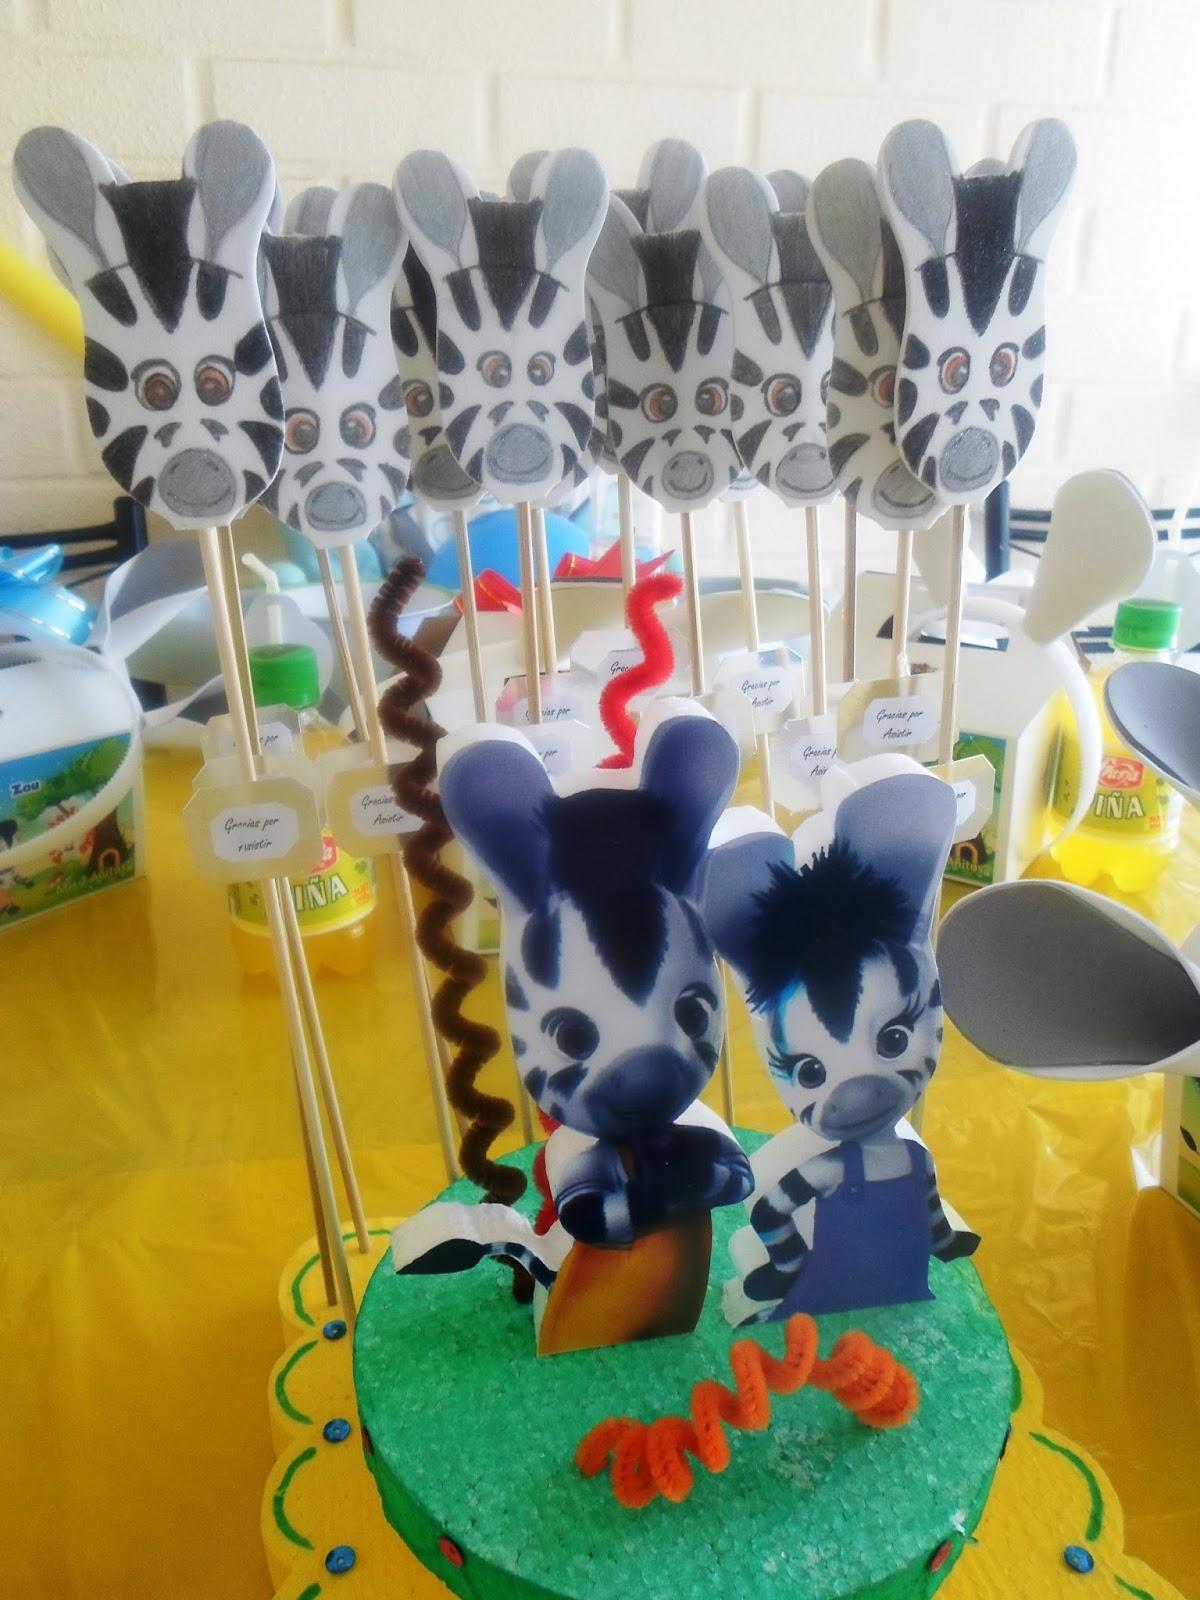 Zou Cumplea?os Decoracion ~ Eventos para tu Beb? ZOU; Chupeteras, C?pulas y centros de mesa